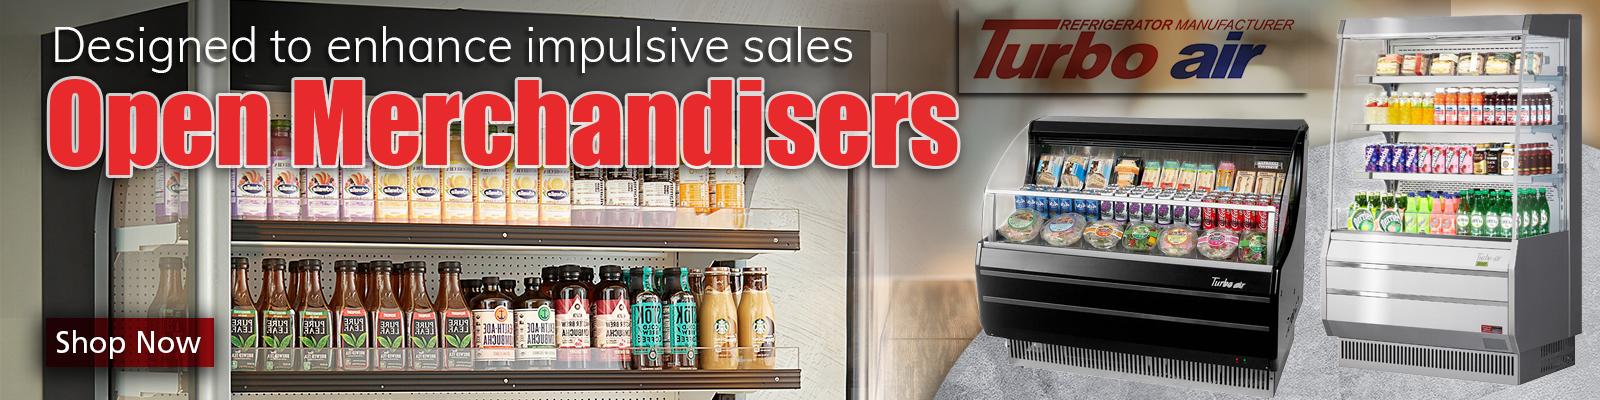 Commercial Open Air Merchandisers Refrigeration, Commercial Open Air Merchandiser